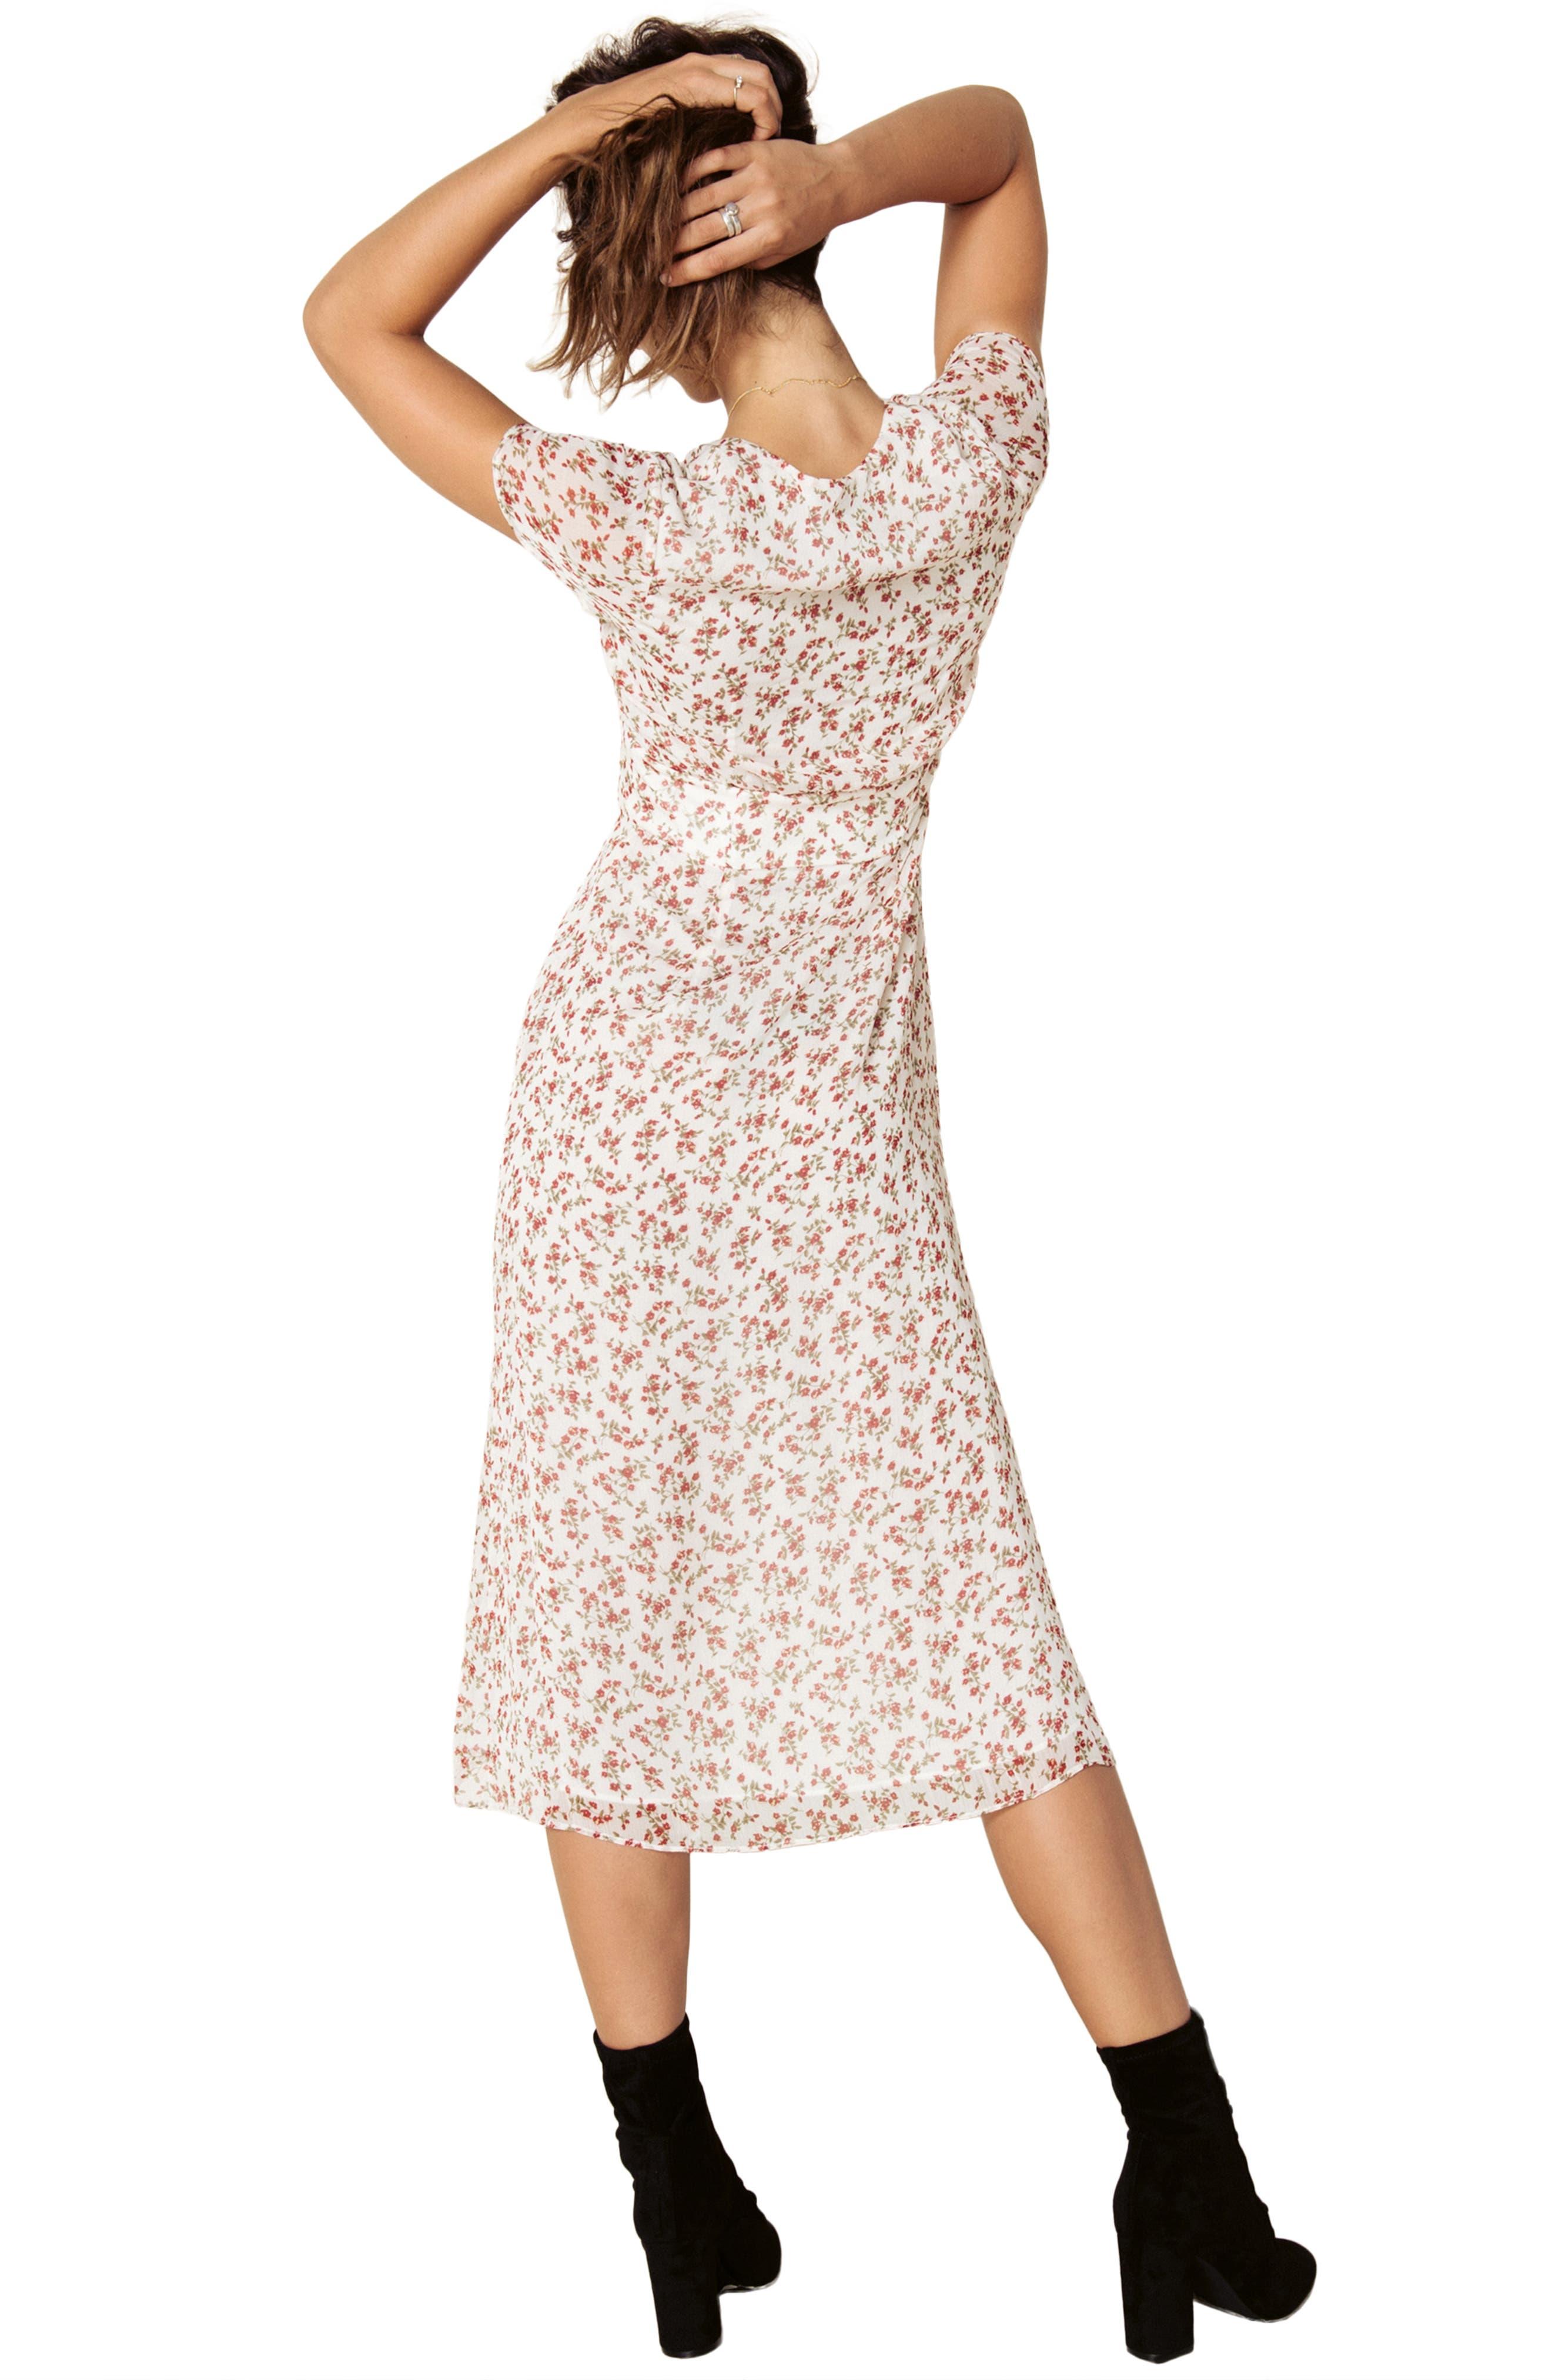 Faretta Midi Dress,                             Alternate thumbnail 8, color,                             RED ROMANCE FLORAL